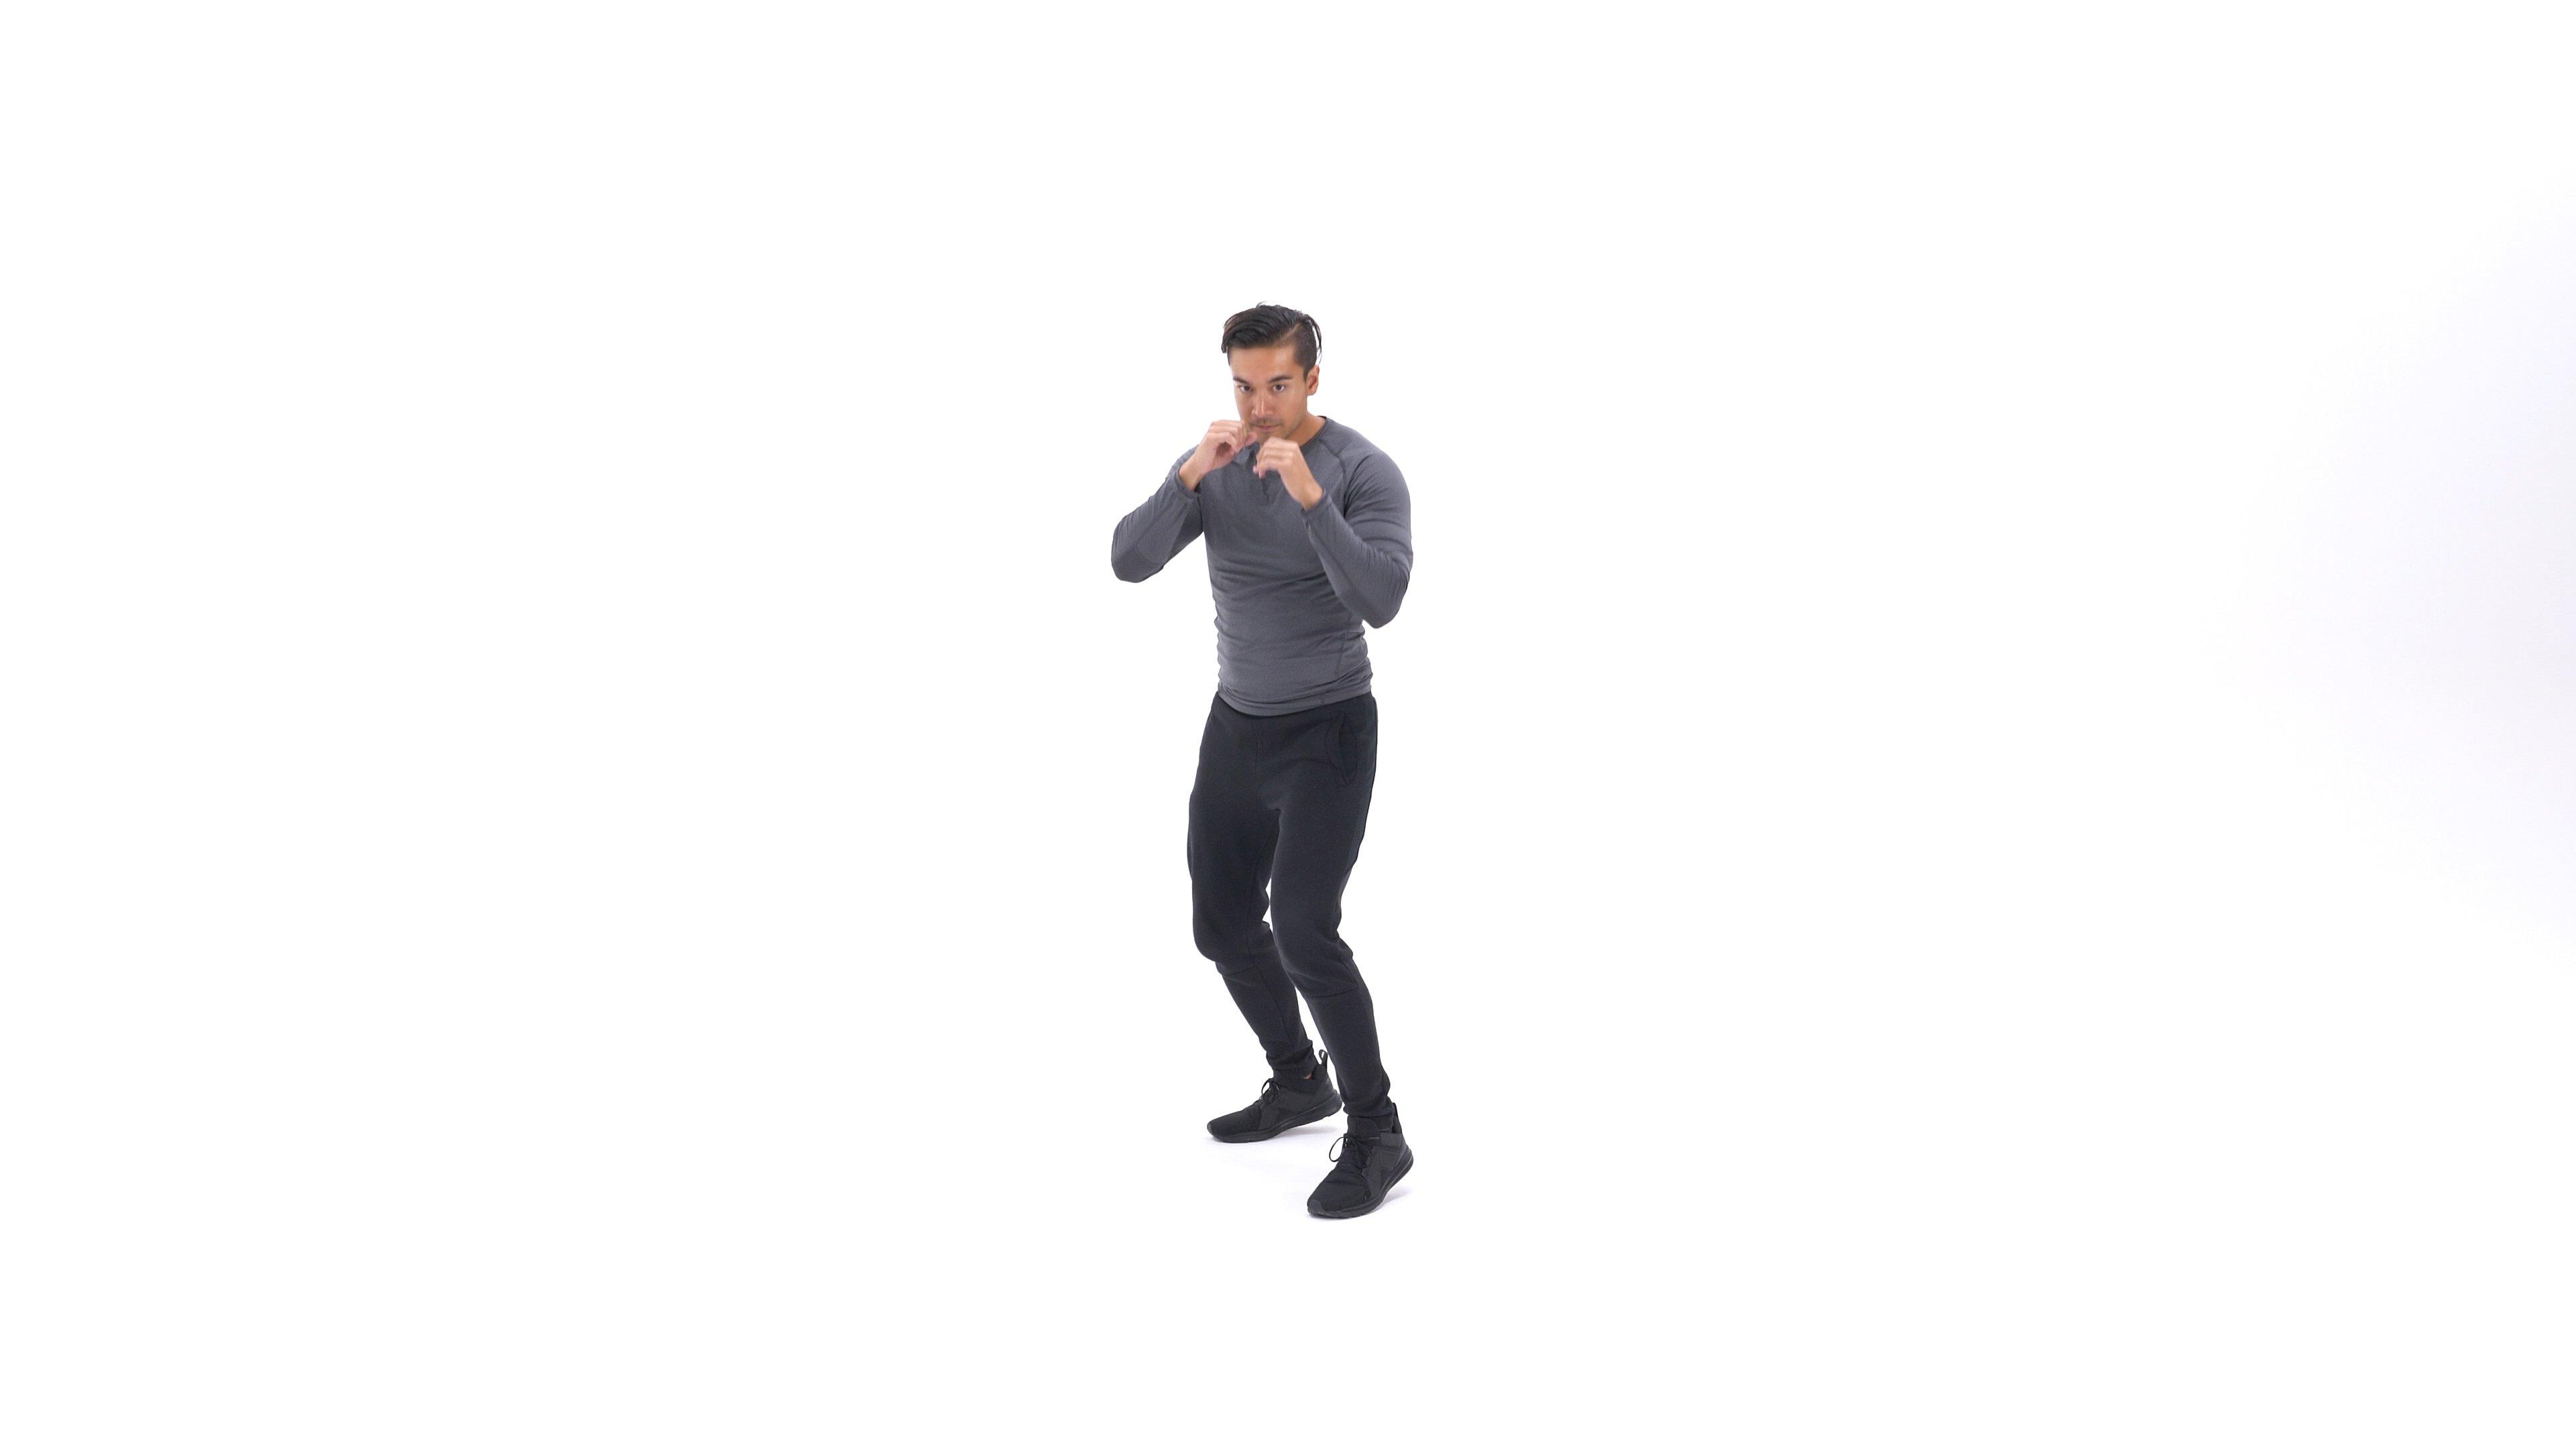 Shadow boxing image